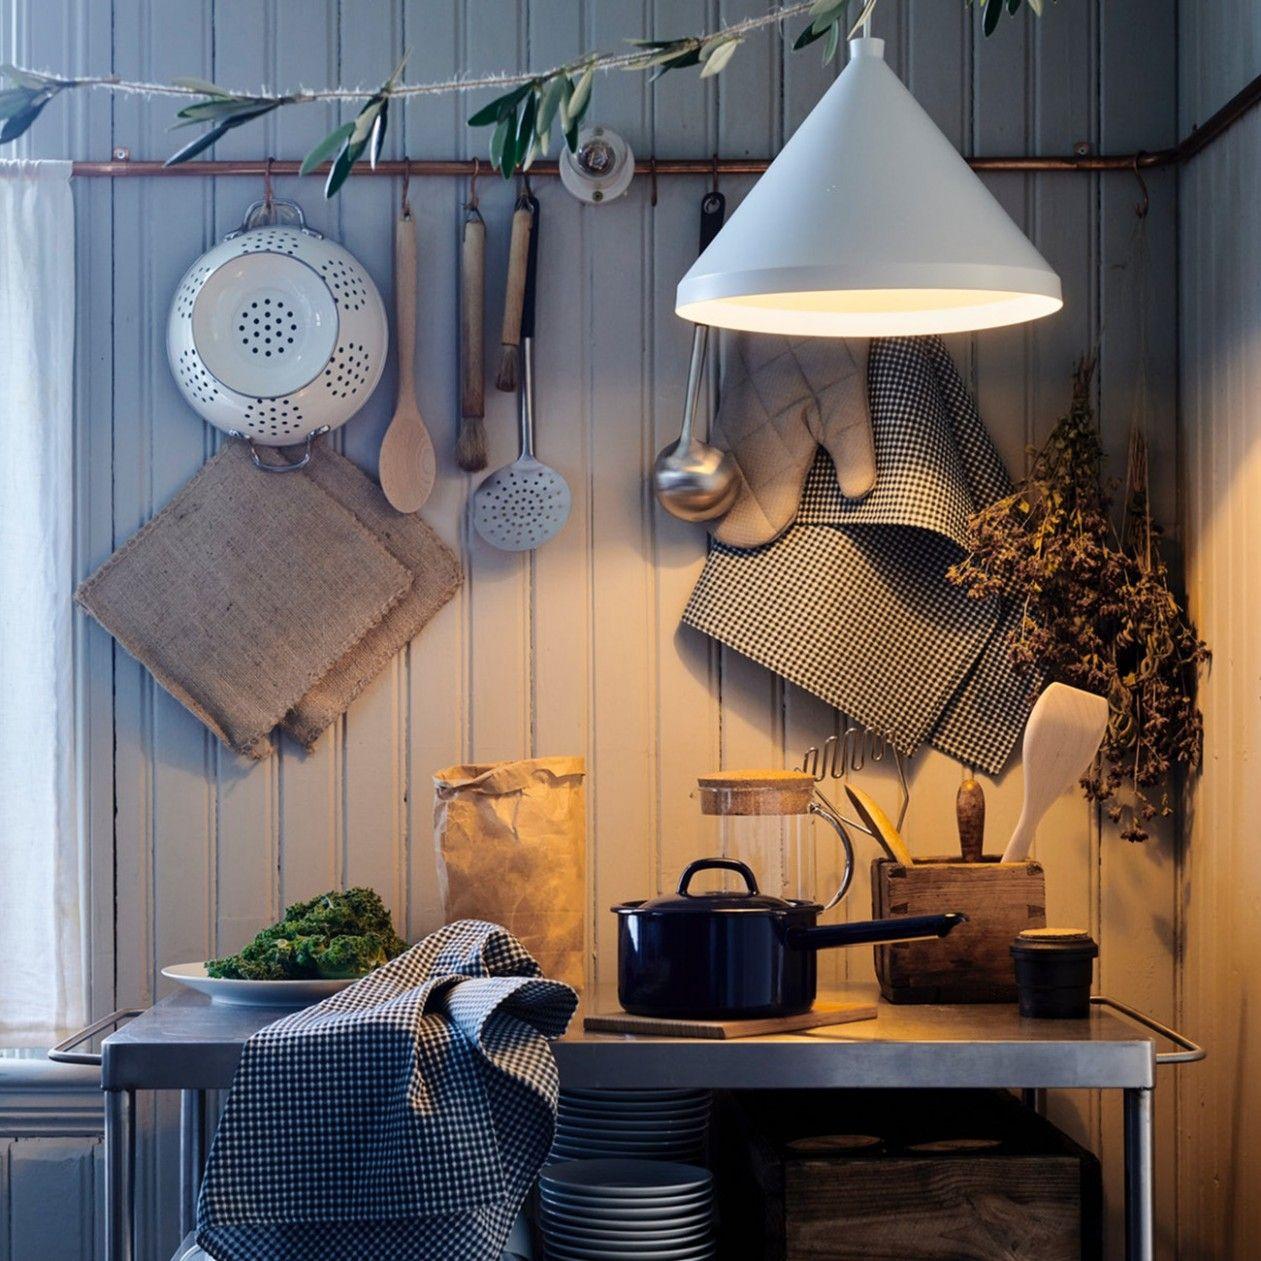 Kitchen Ikea Cyprus in 10  Ikea home, Decor, Home decor